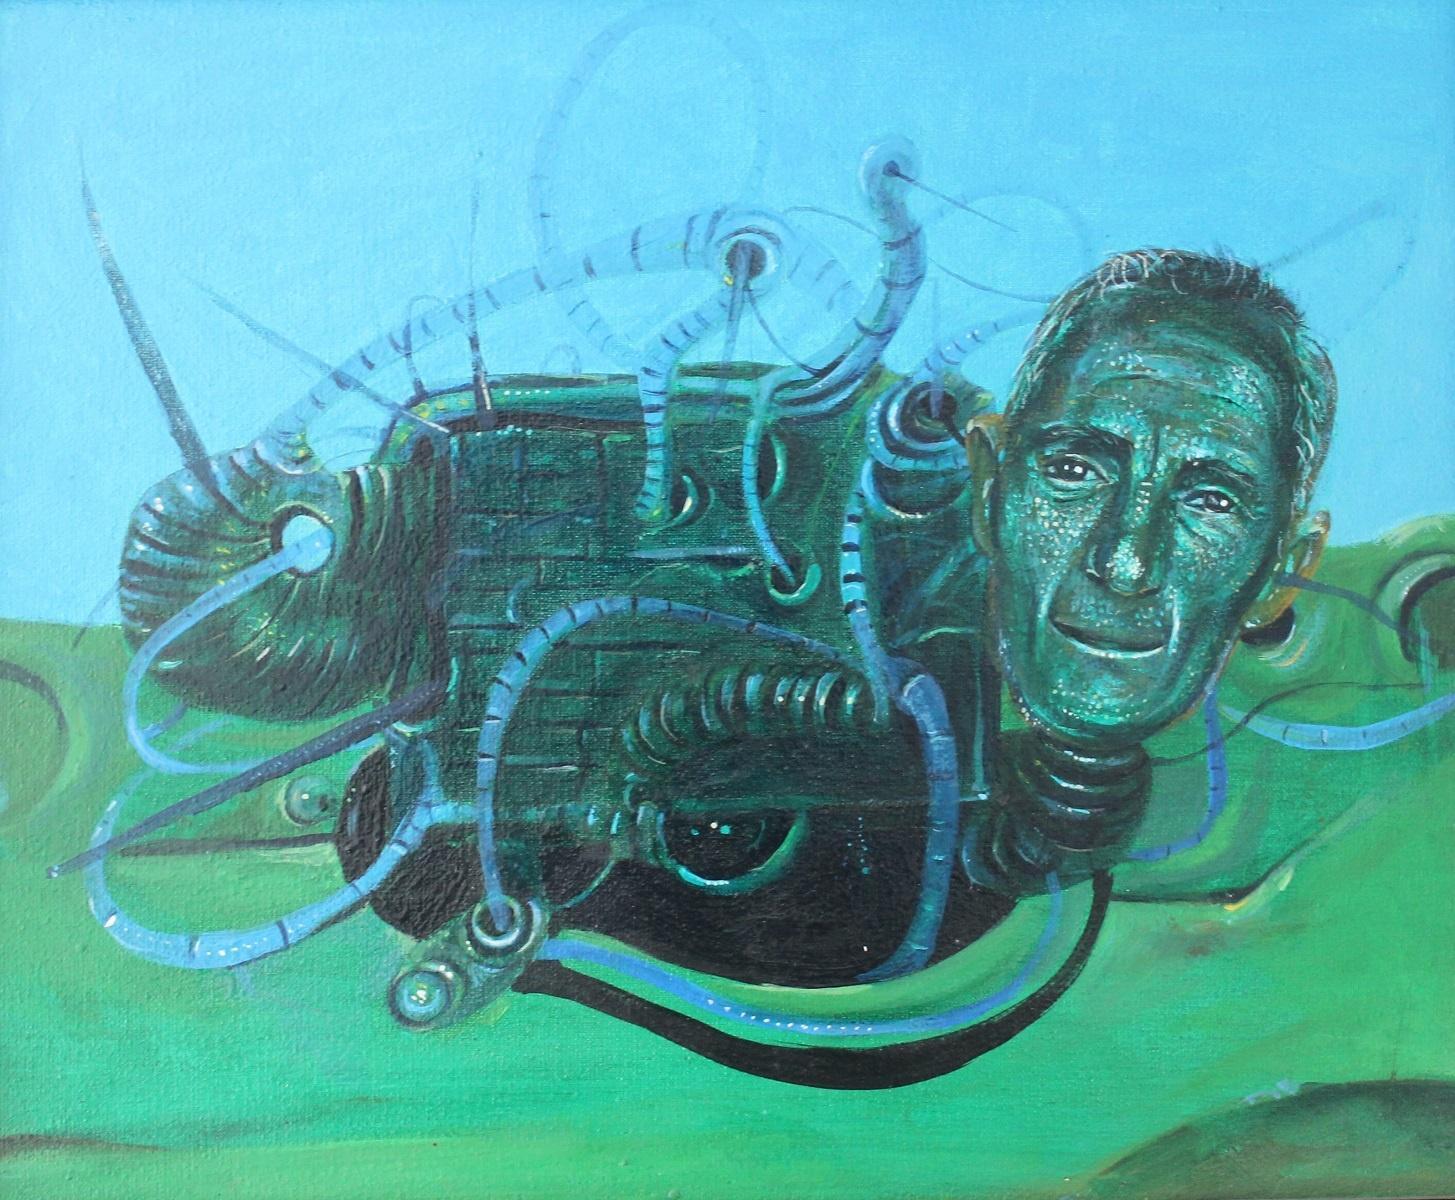 Blue composition -  Contemporary Surreal Painting, Vibrant Blue, monochromatic